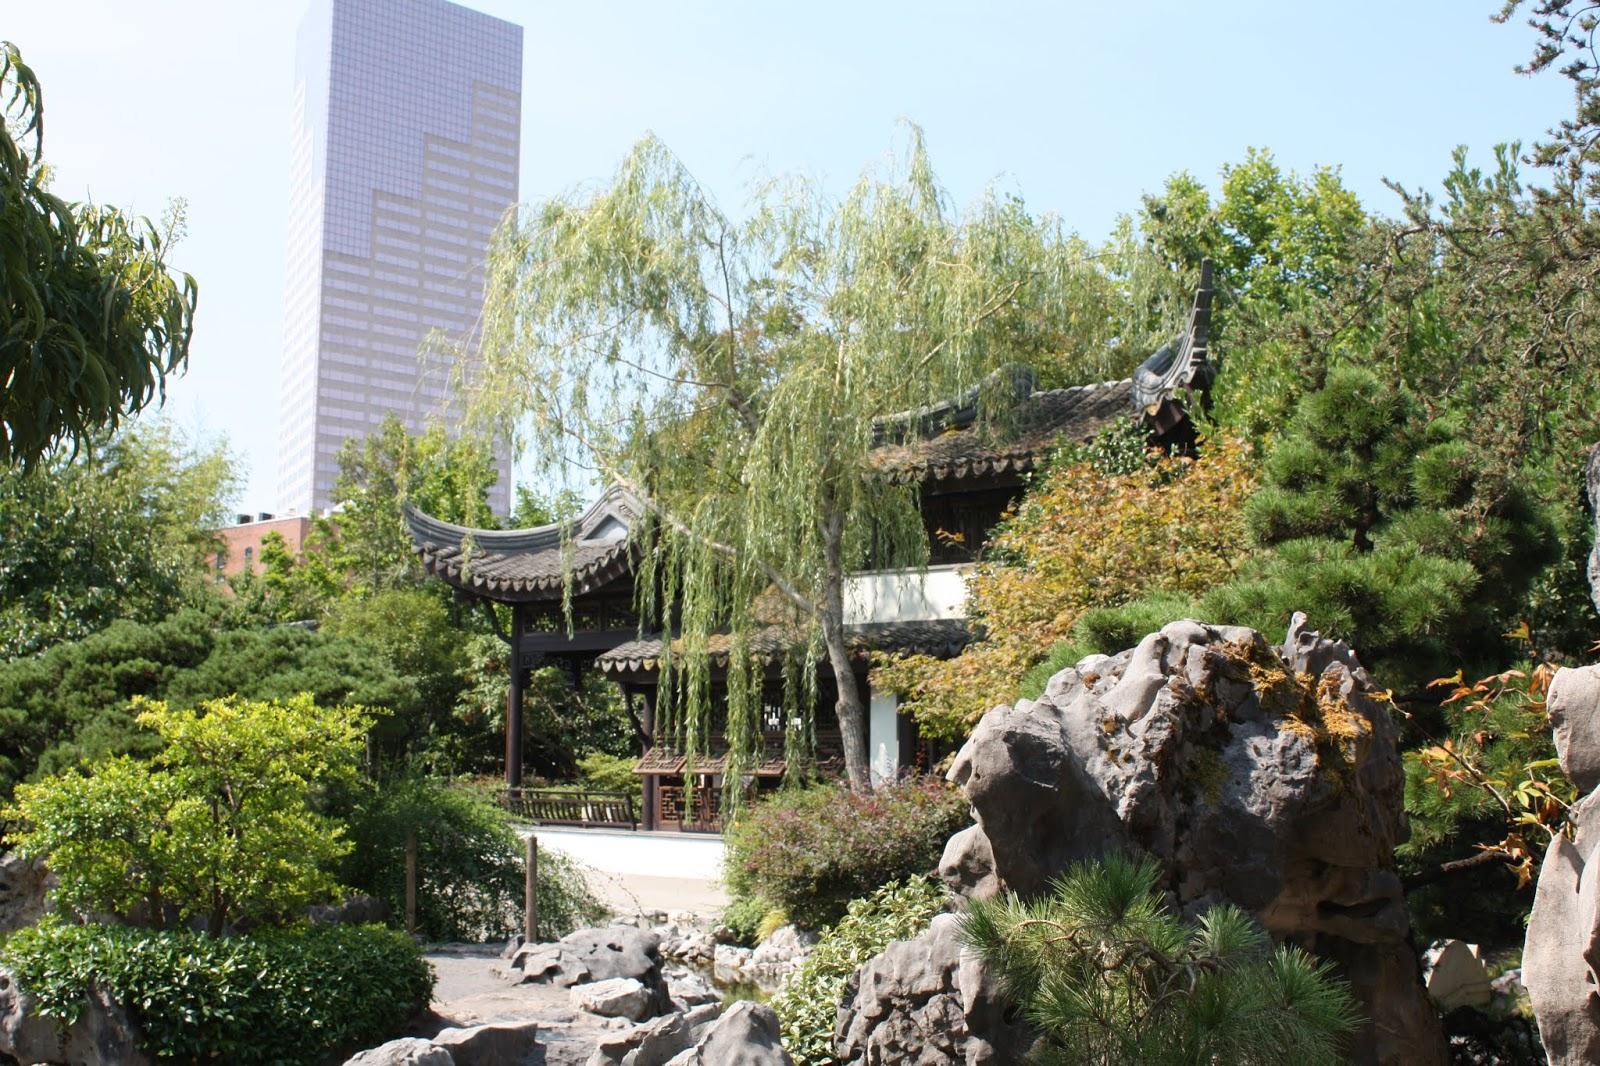 lan su chinese garden in portland oregon - Chinese Garden Portland